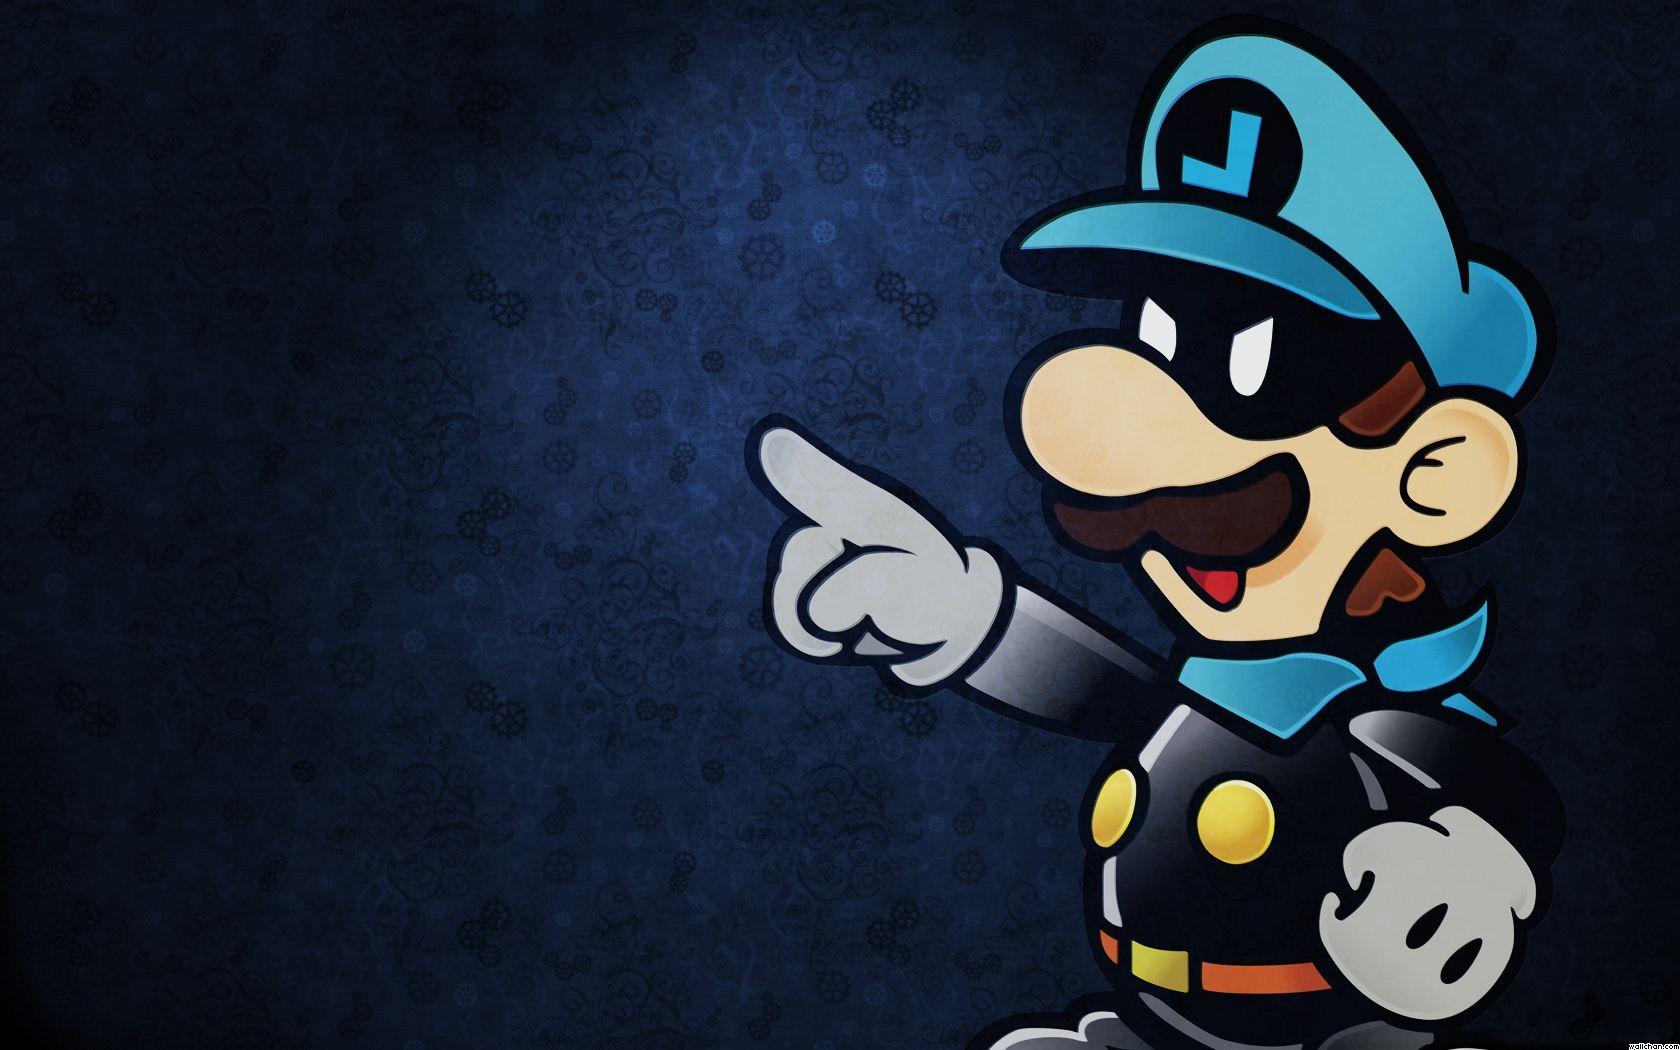 Blue Luigi Wallpaper | Games Wallpapers | Paper mario 64